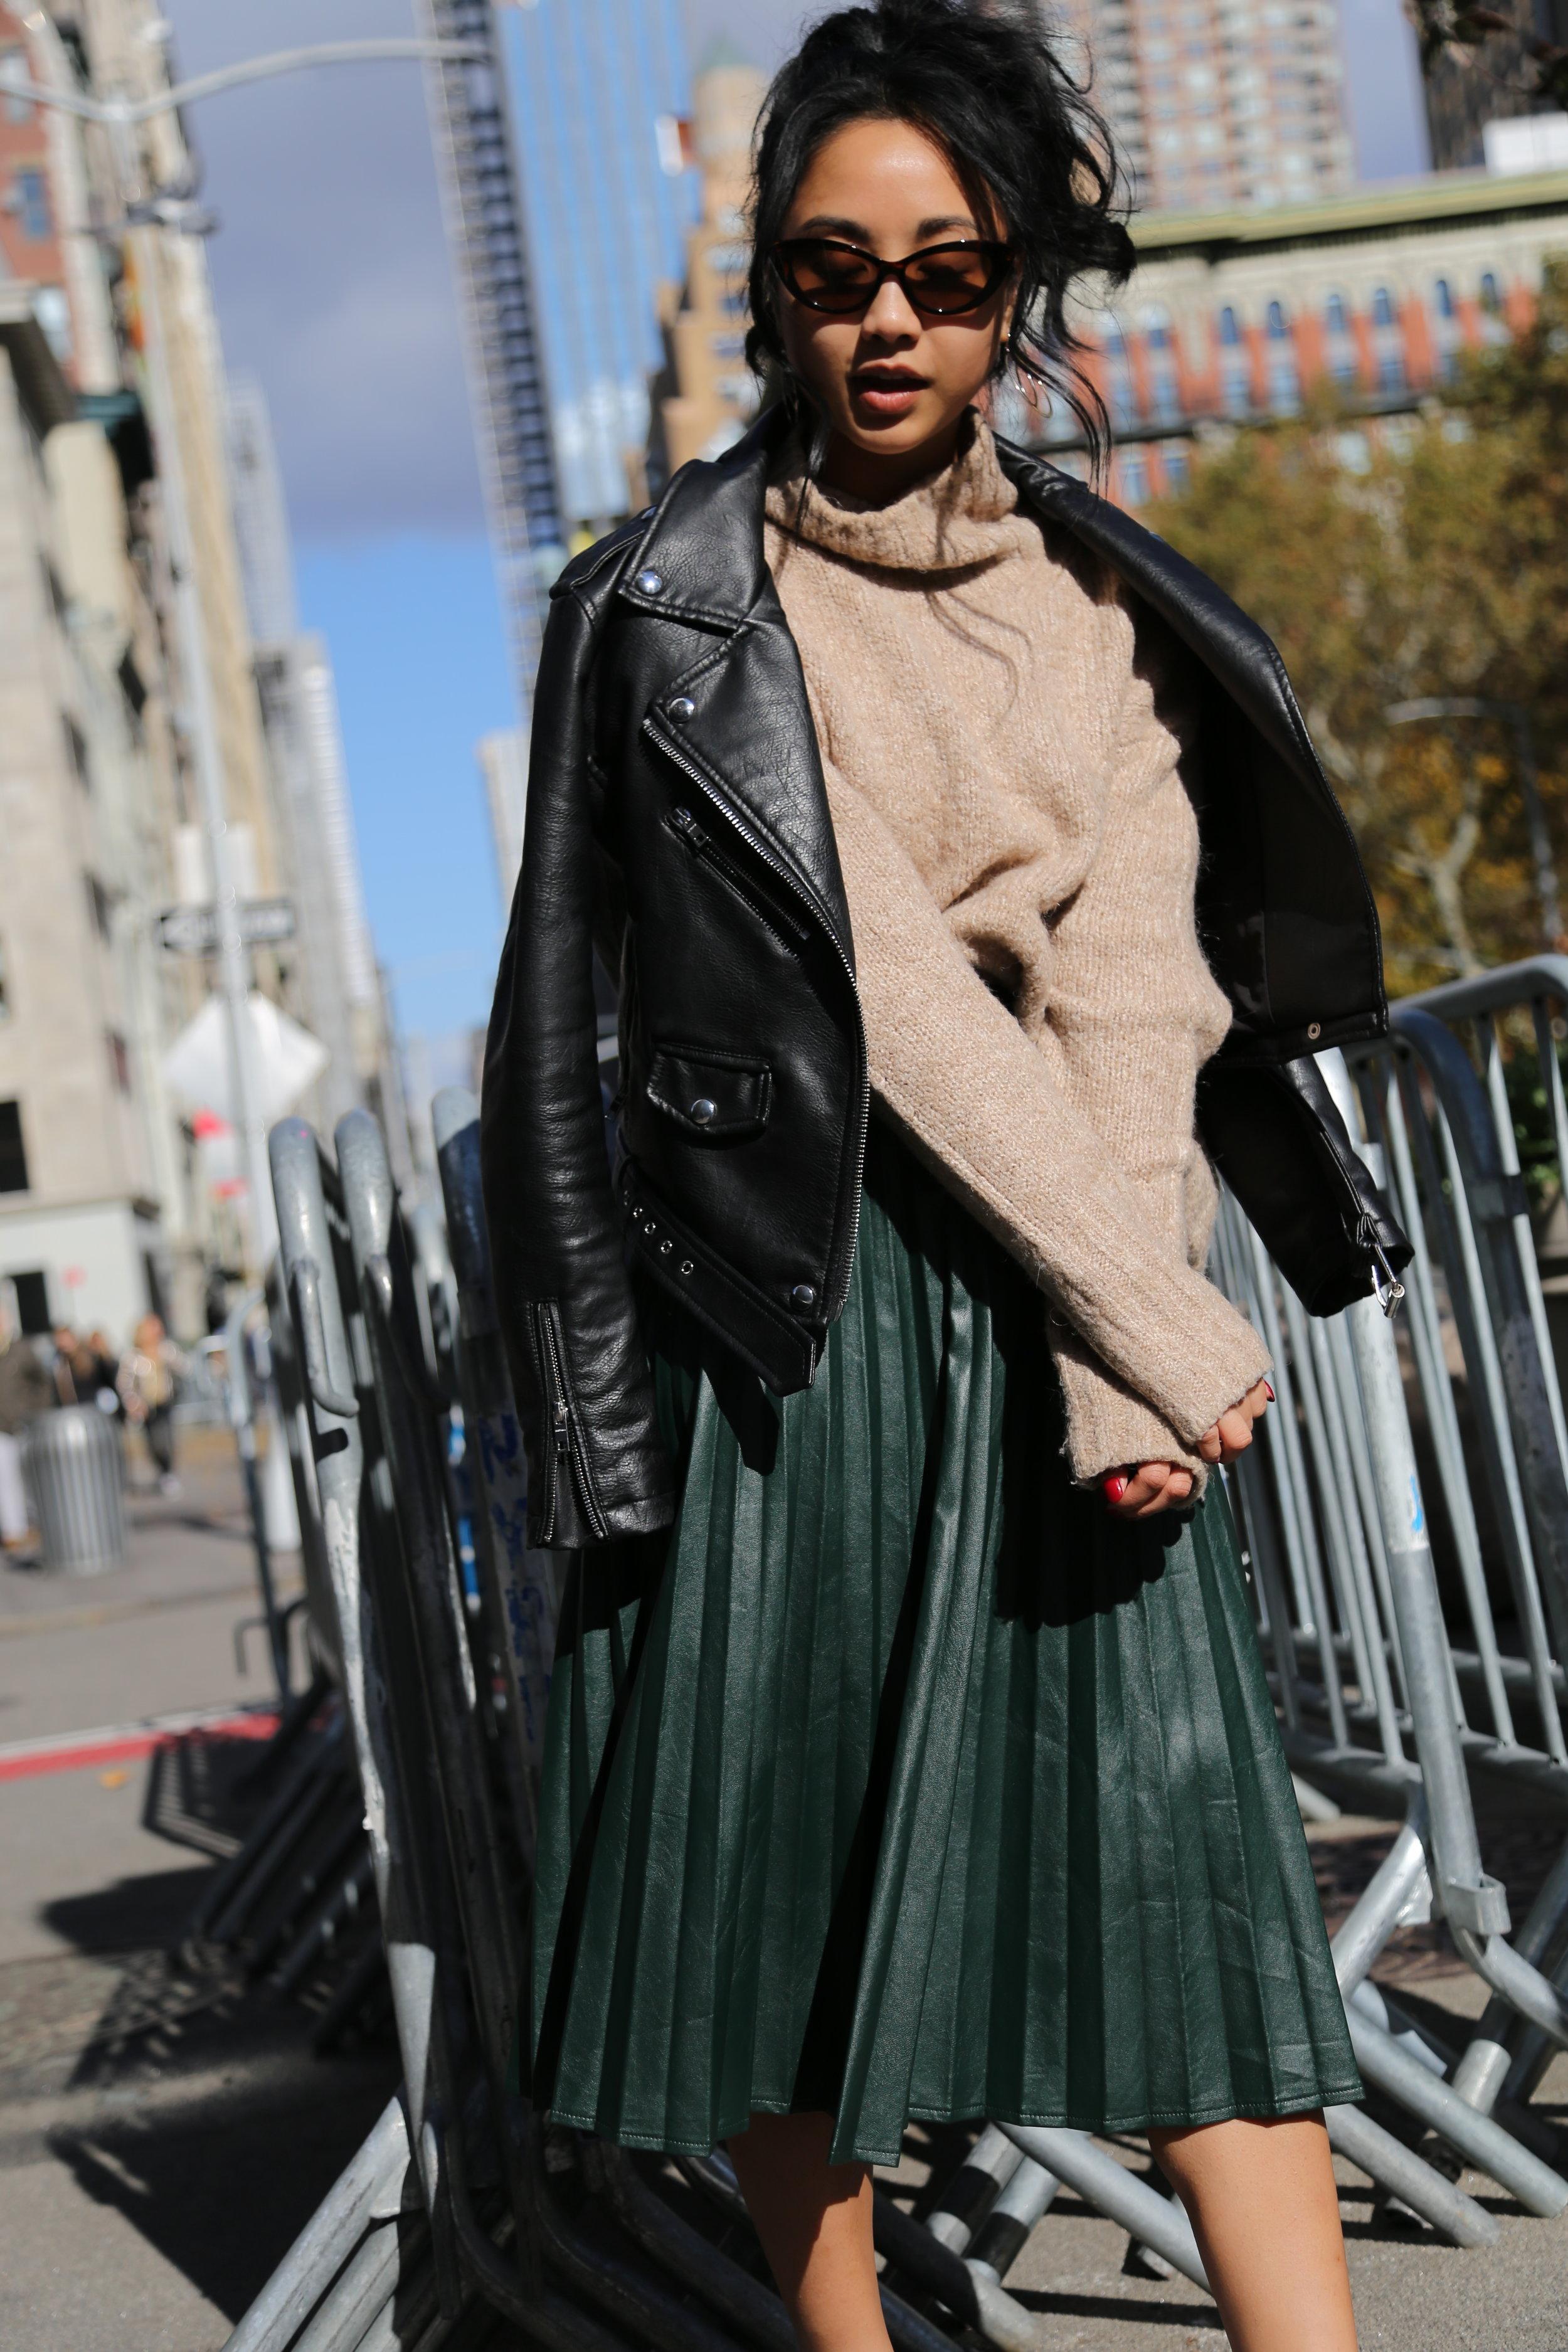 Bershka faux leather jacket // H&M sweater // Zaful skirt // Adidas sneakers  Photography by  Kit Michele